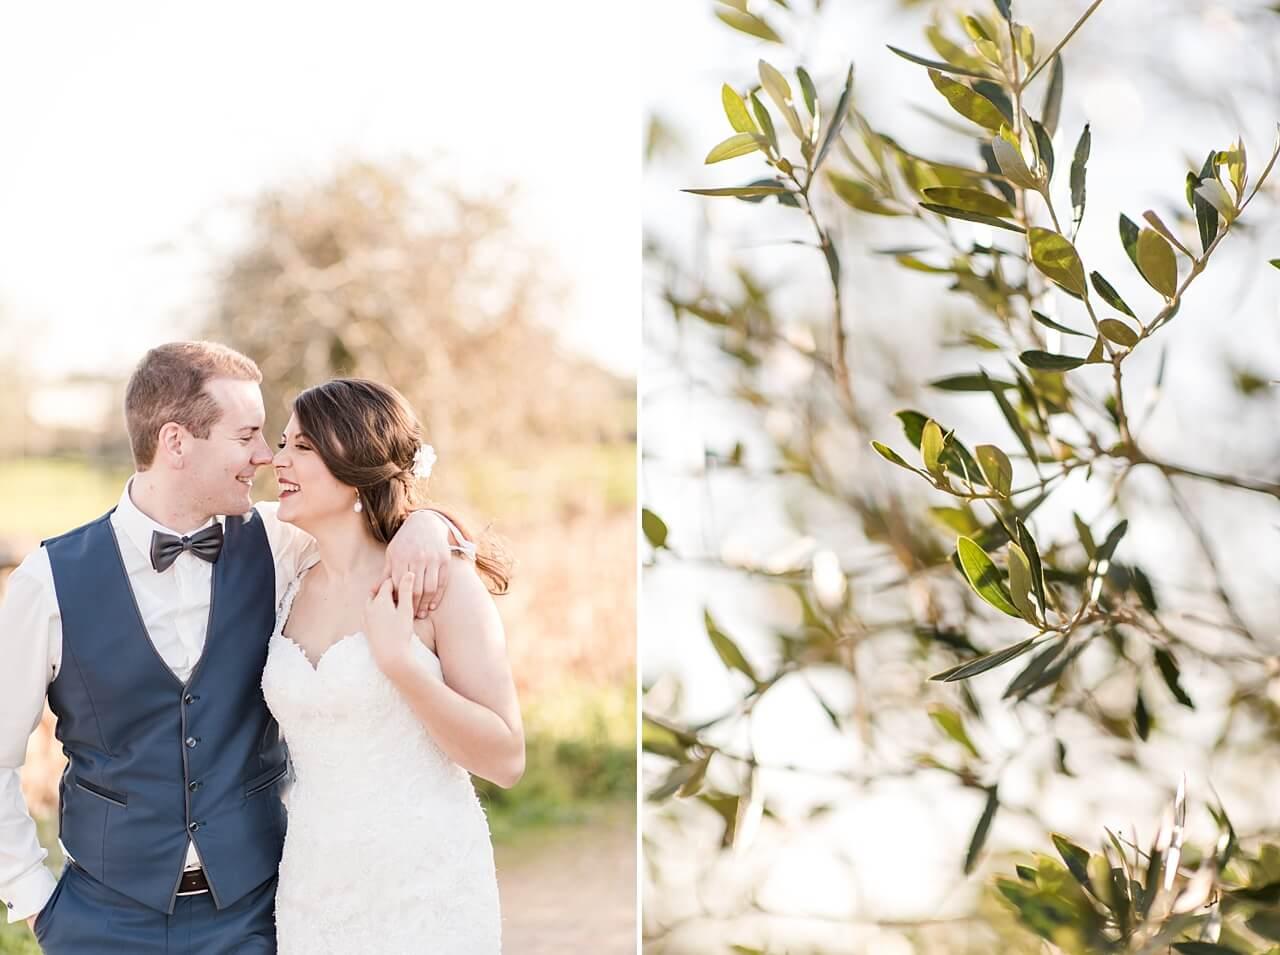 Rebecca Conte Fotografie: After Wedding Shoot Mallorca 31